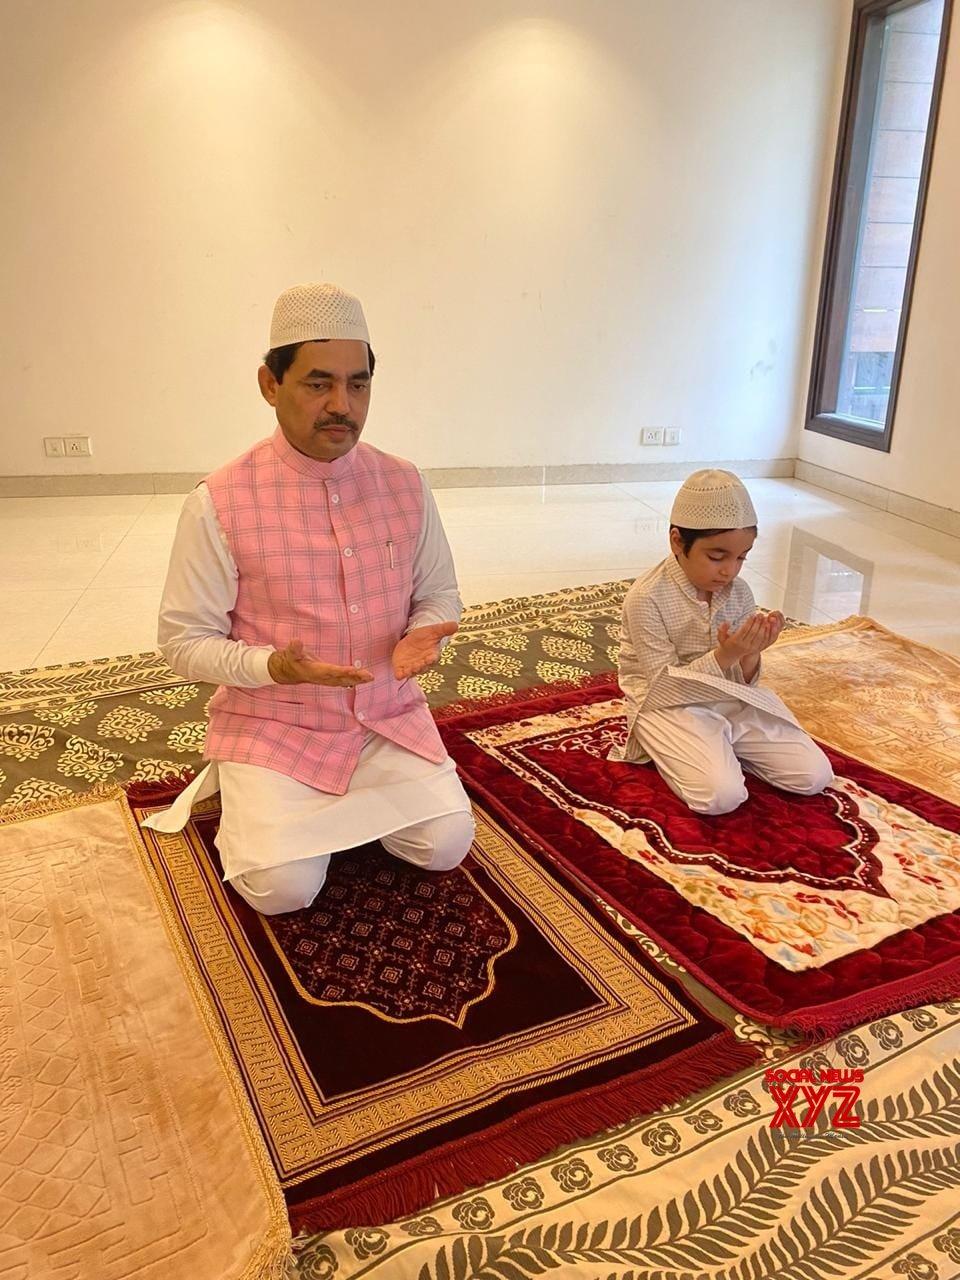 New Delhi: Shahnawaz Hussain offers namaz on the occasion of Eid - Ul - Zuha #Gallery